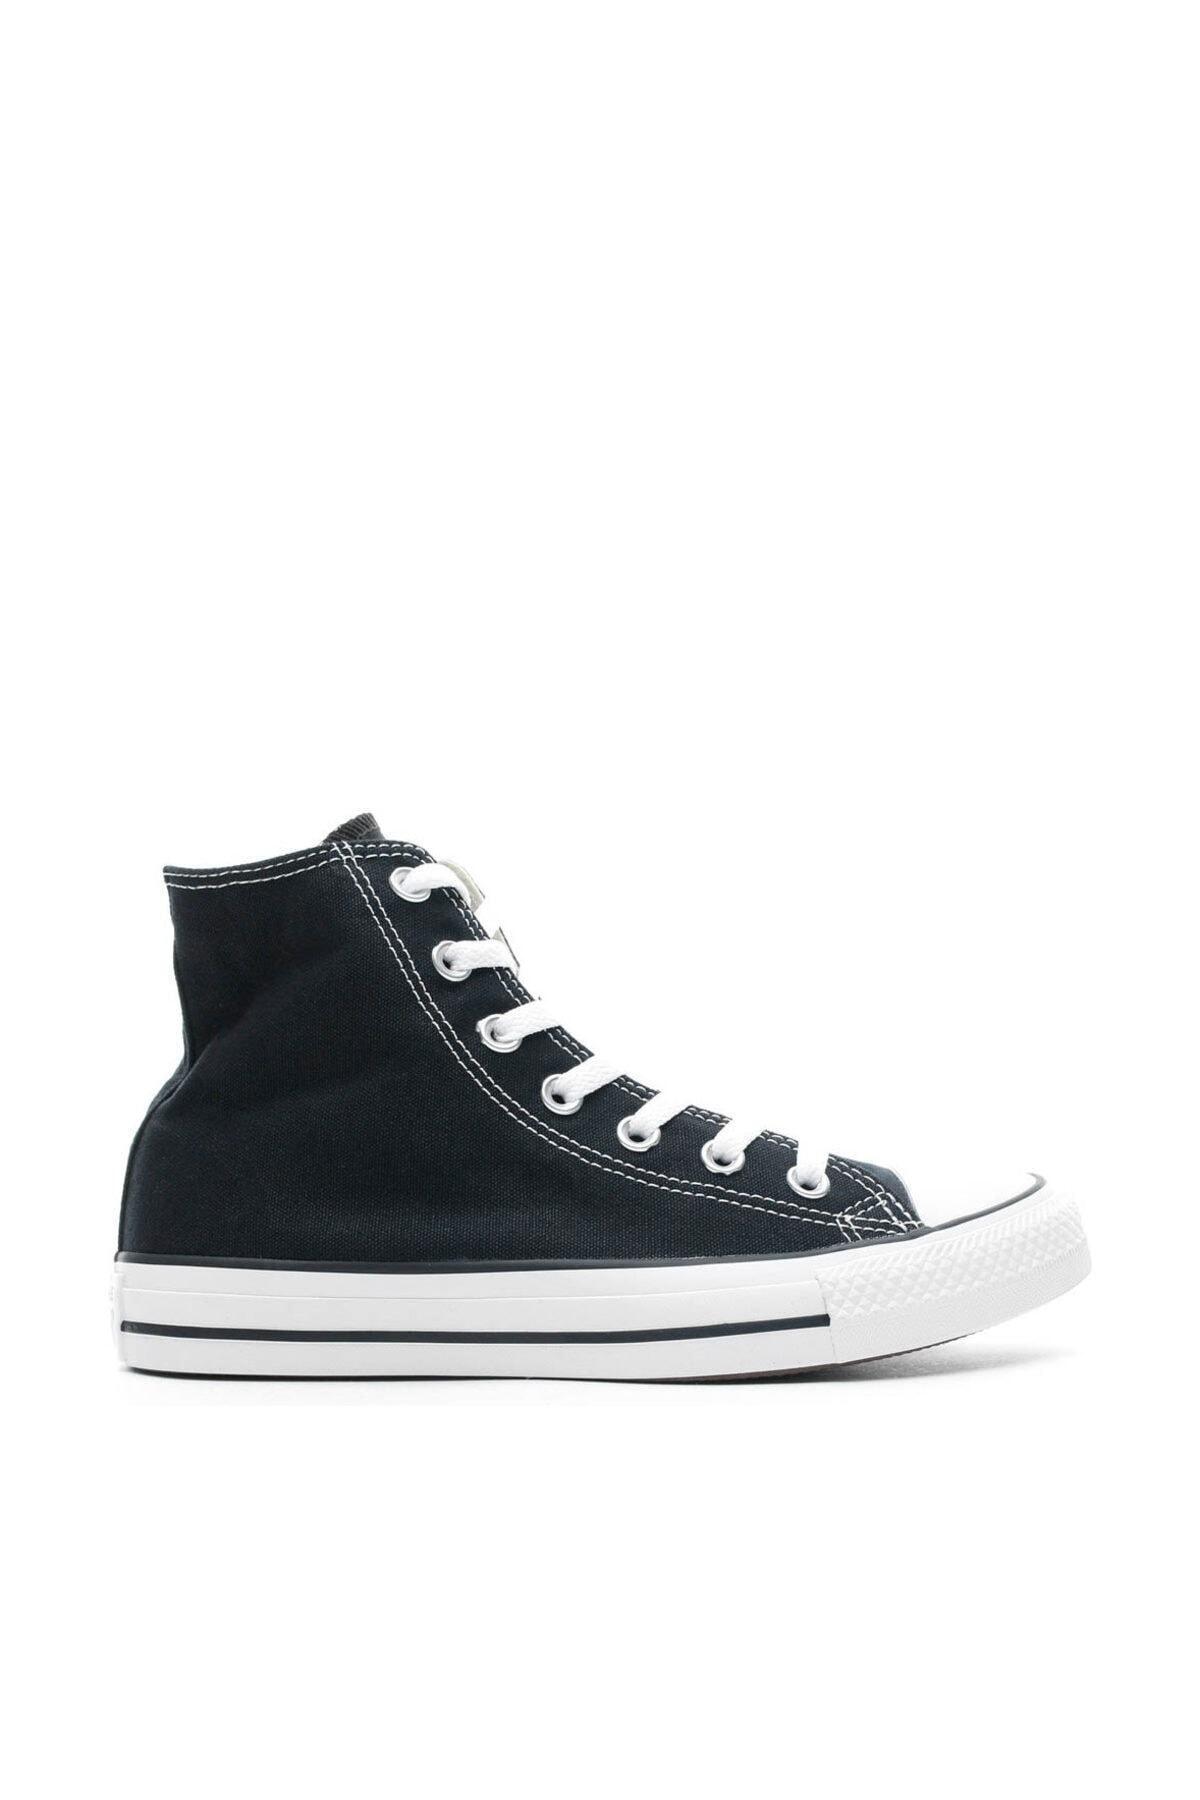 converse Unisex Siyah Chuck Taylor All Star Hi Sneaker 1